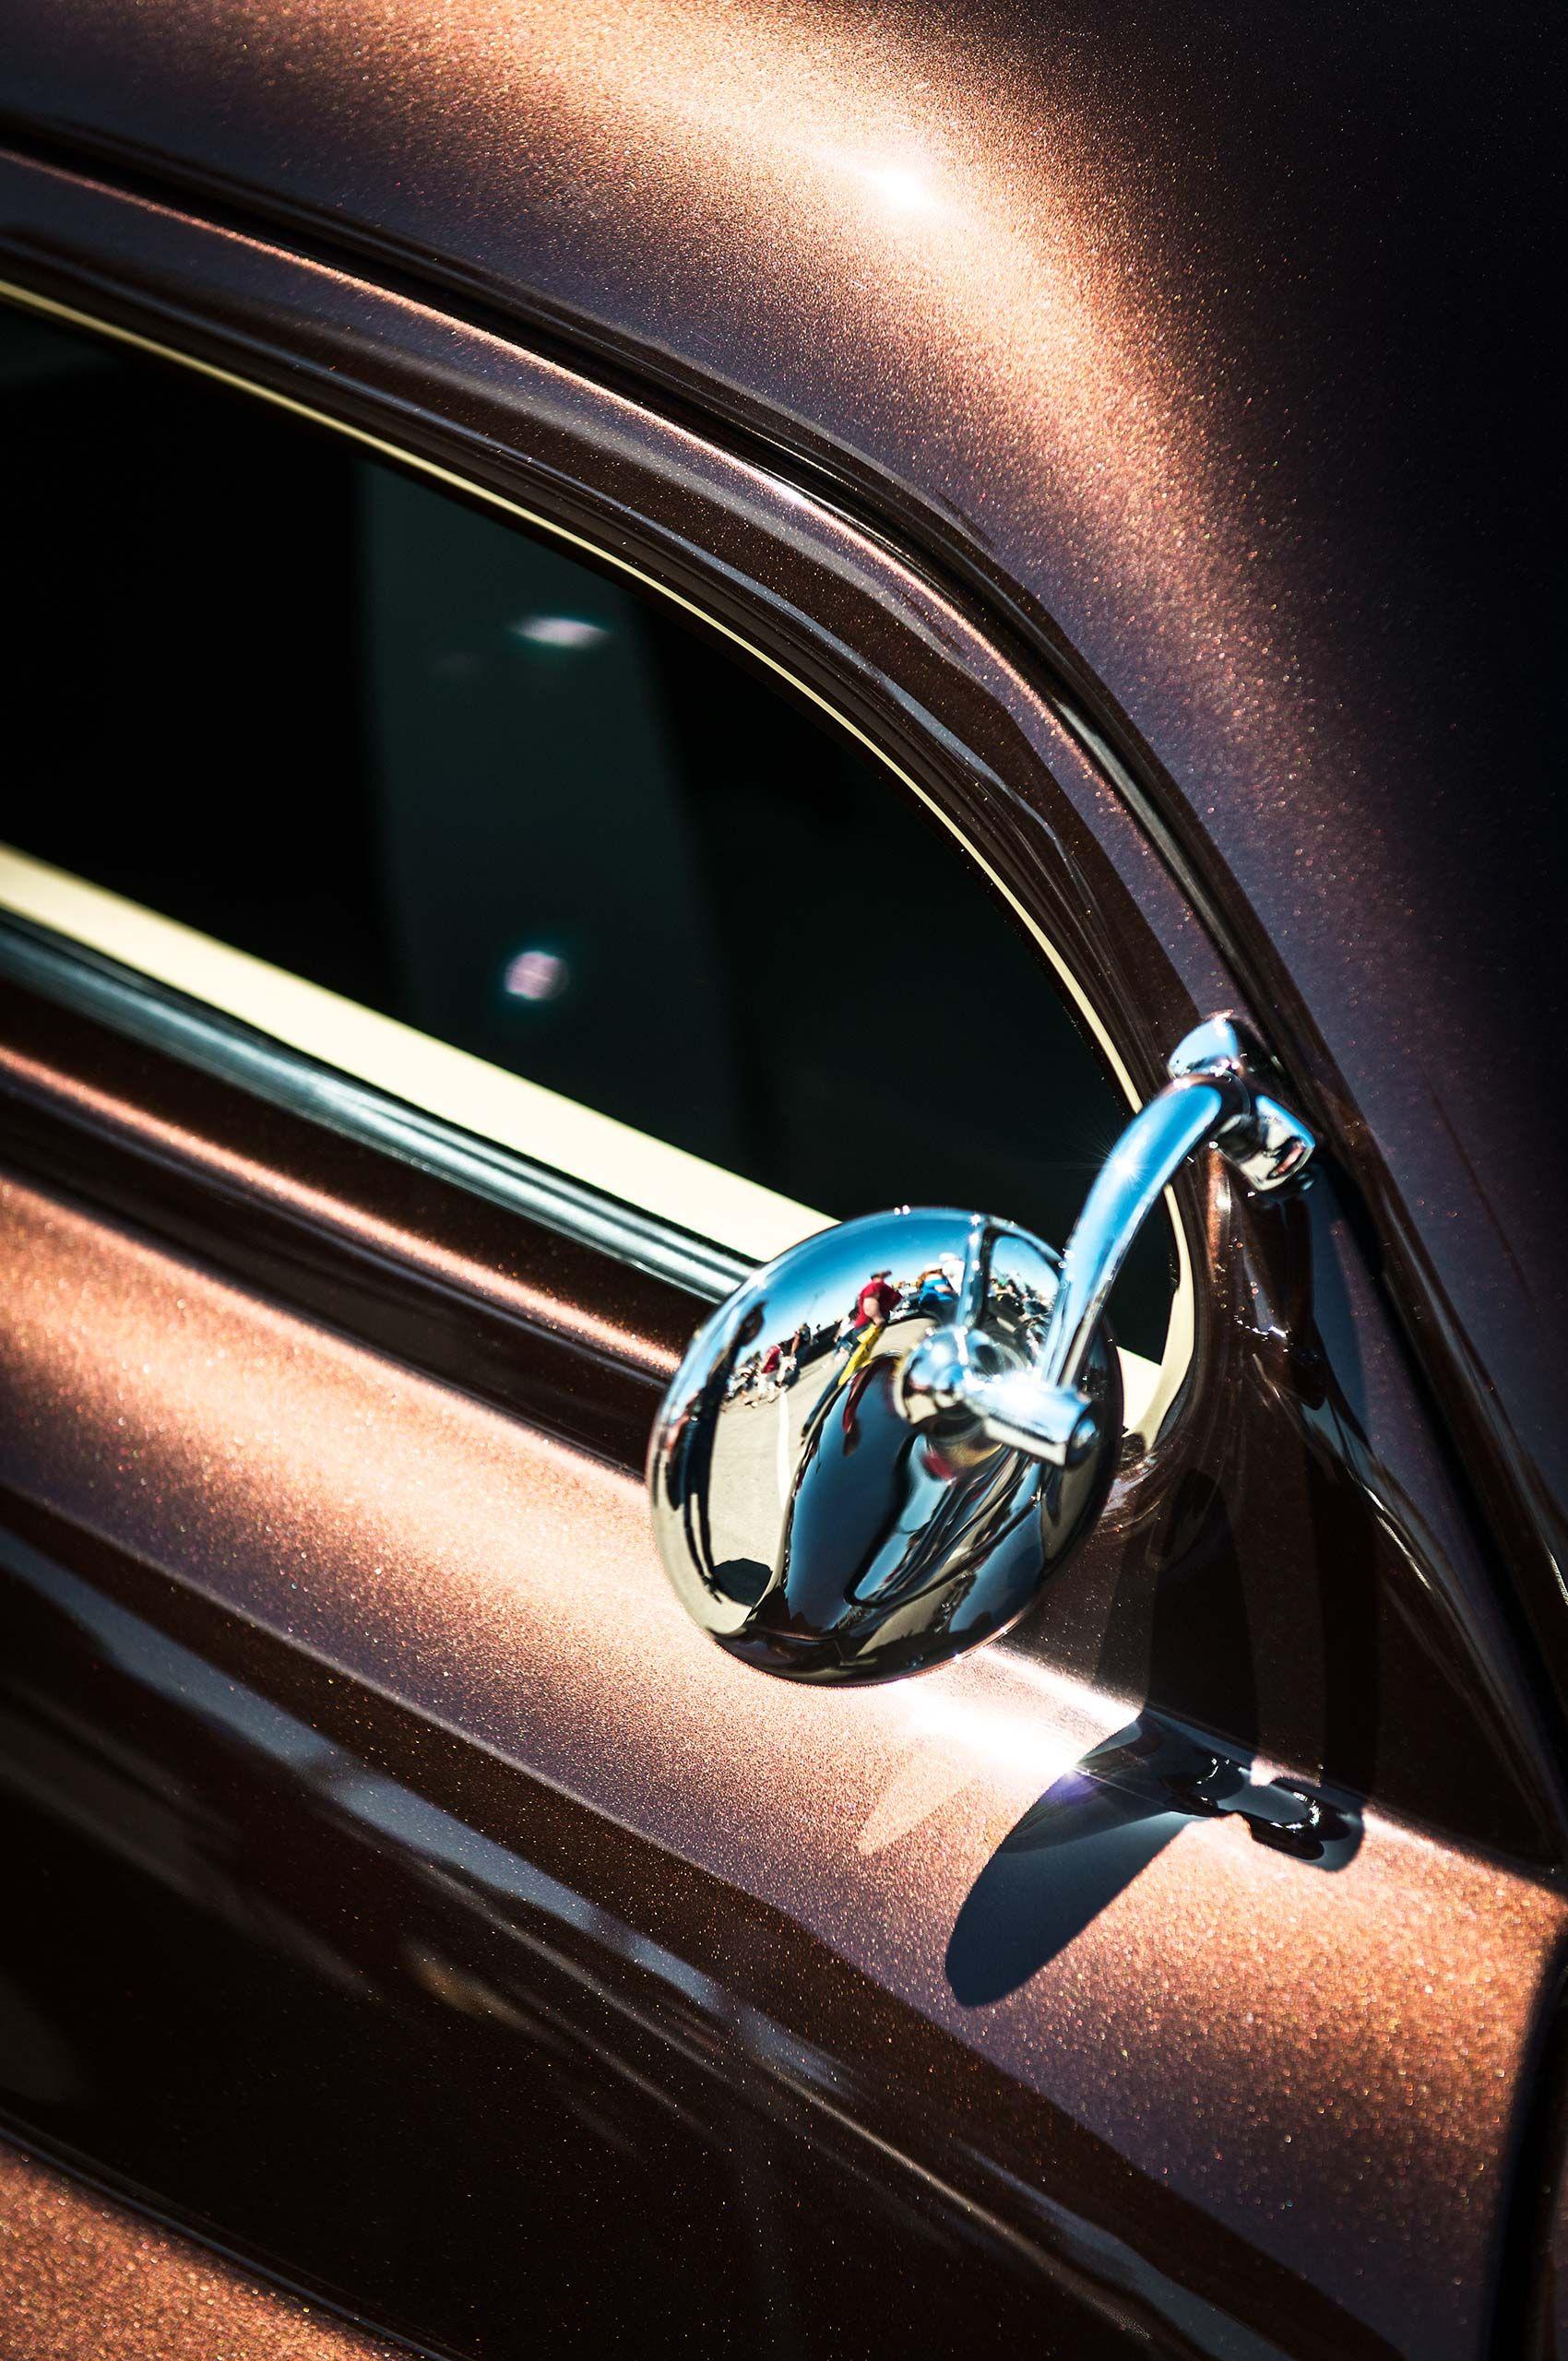 dark-car-detail-vivalasvegas-HenrikOlundPhotography.jpg